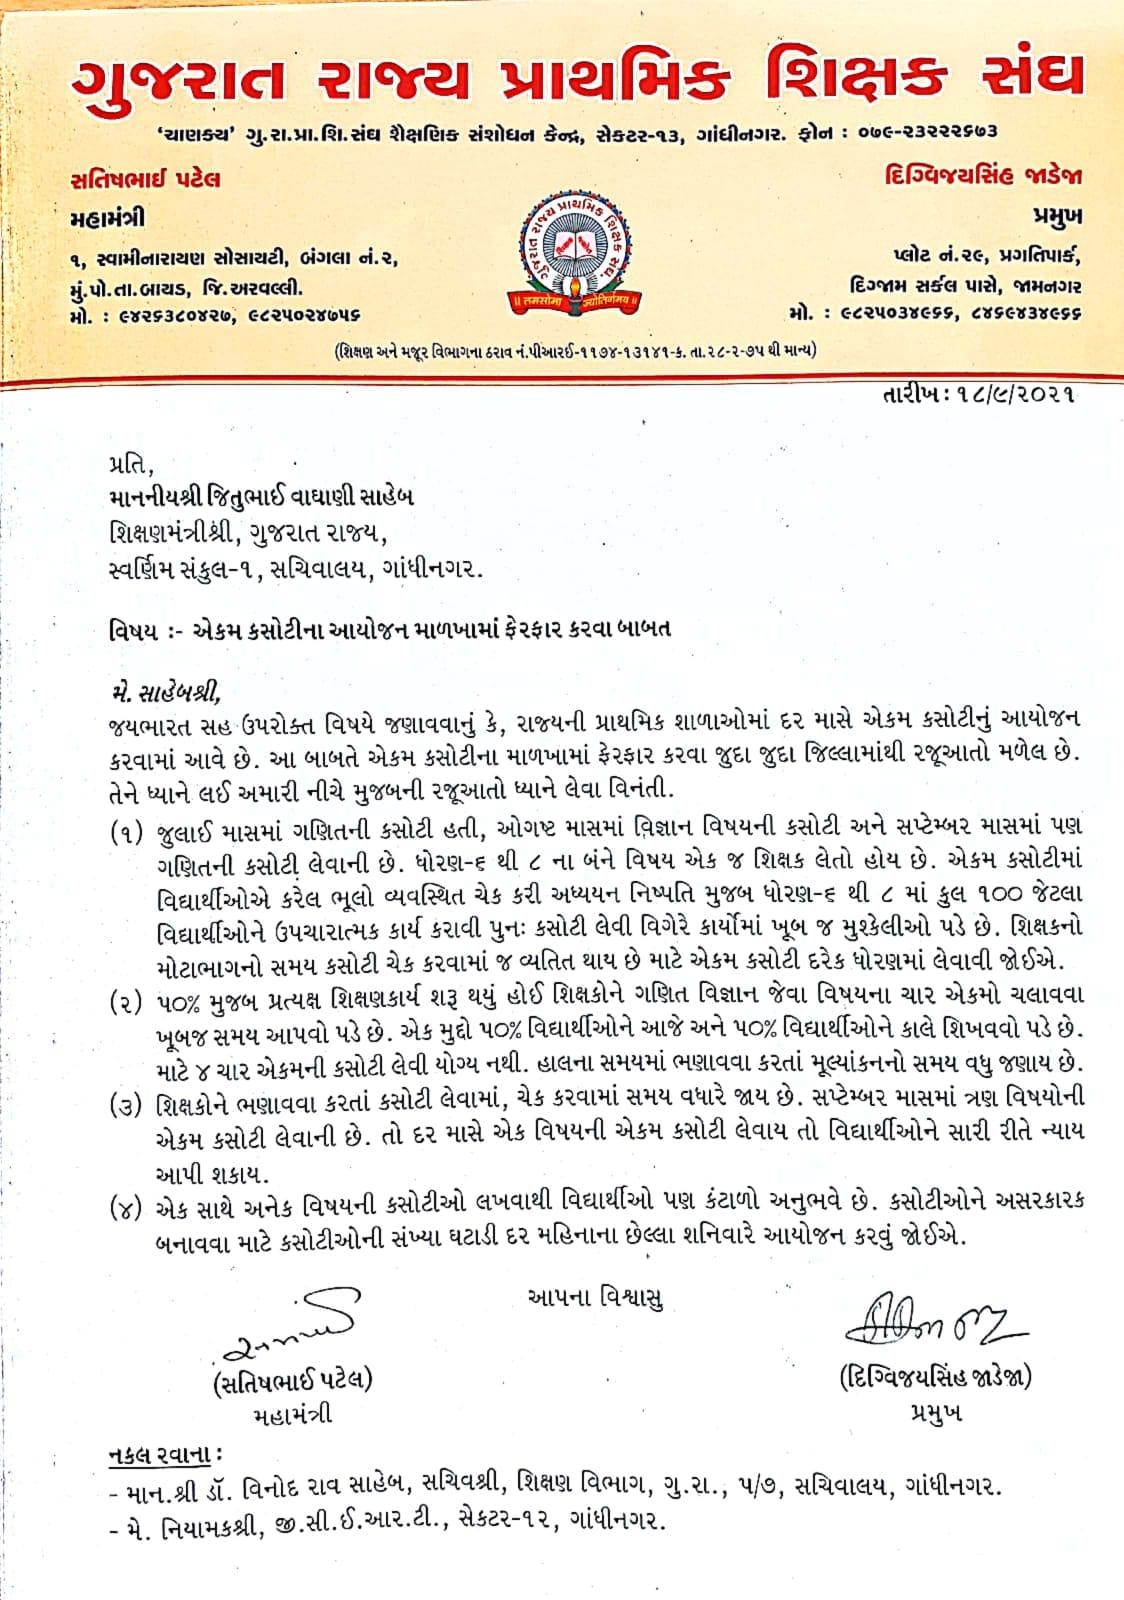 http://www.pravinvankar.in/2021/09/unit-test-babat-mahtvapurn-rajuaat.html